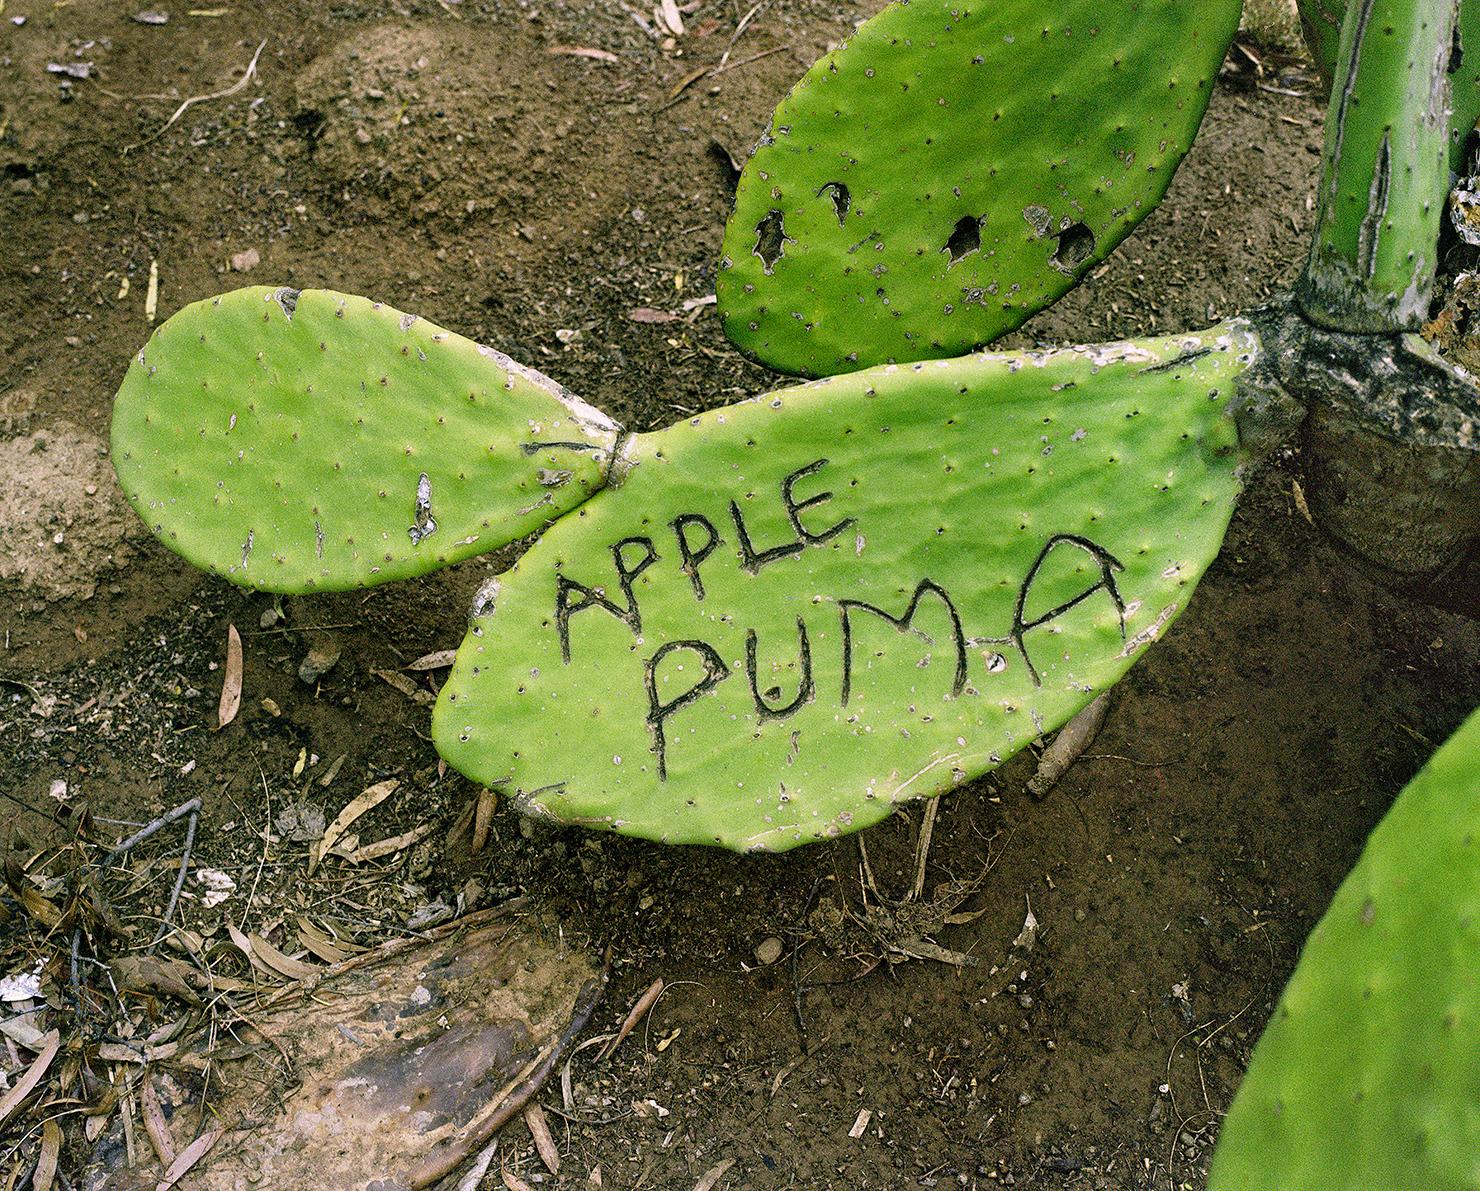 …KobieNel_ApplePuma.jpg